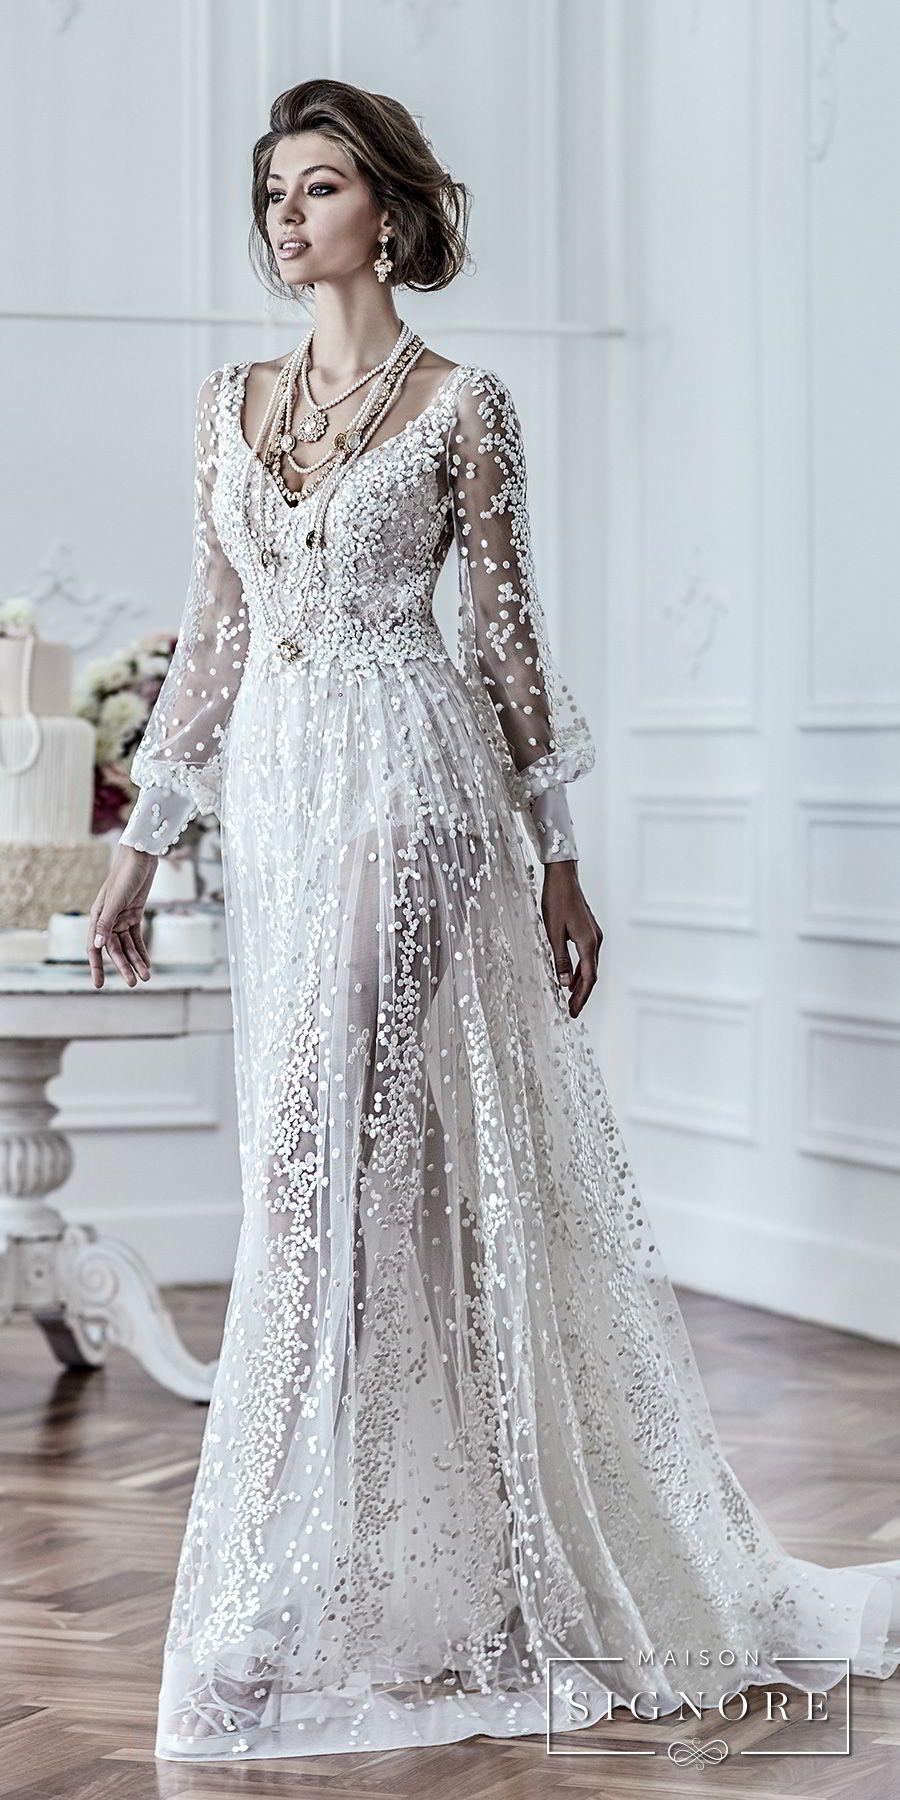 Wedding Inspirasi @ Tumblr | Gelinlikler | Pinterest